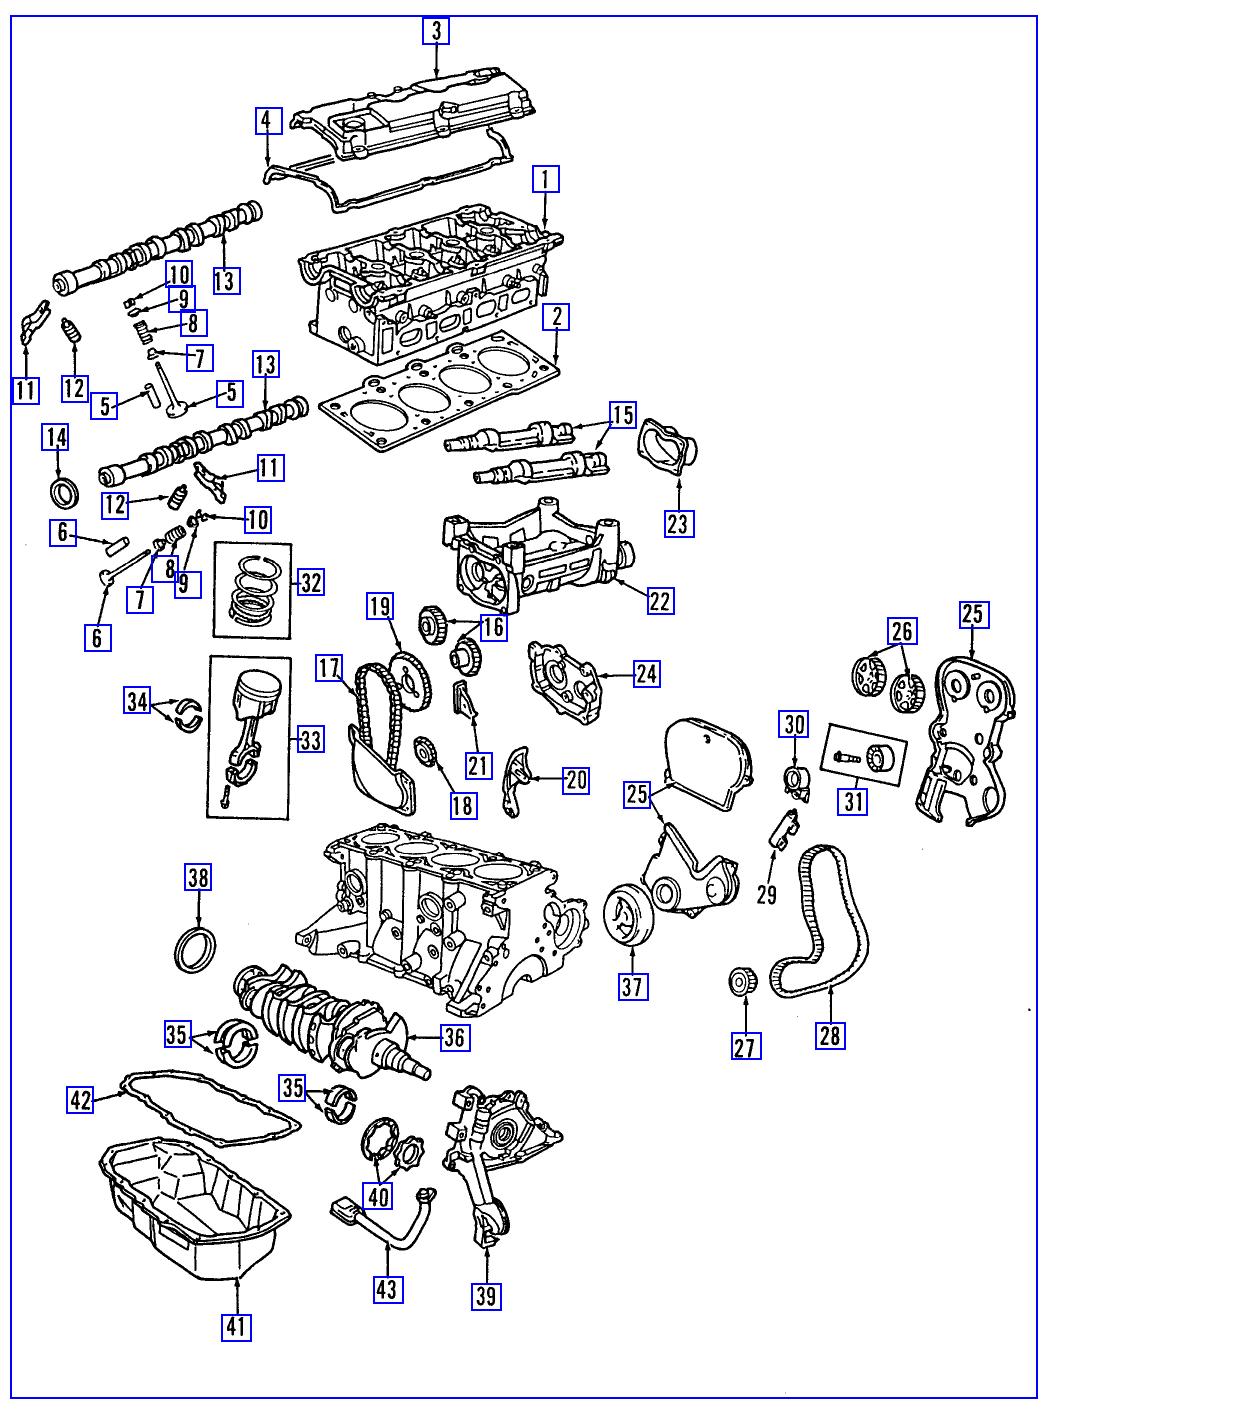 dodge neon engine parts diagram vl 6630  2001 dodge stratus ignition wiring diagram download diagram  2001 dodge stratus ignition wiring